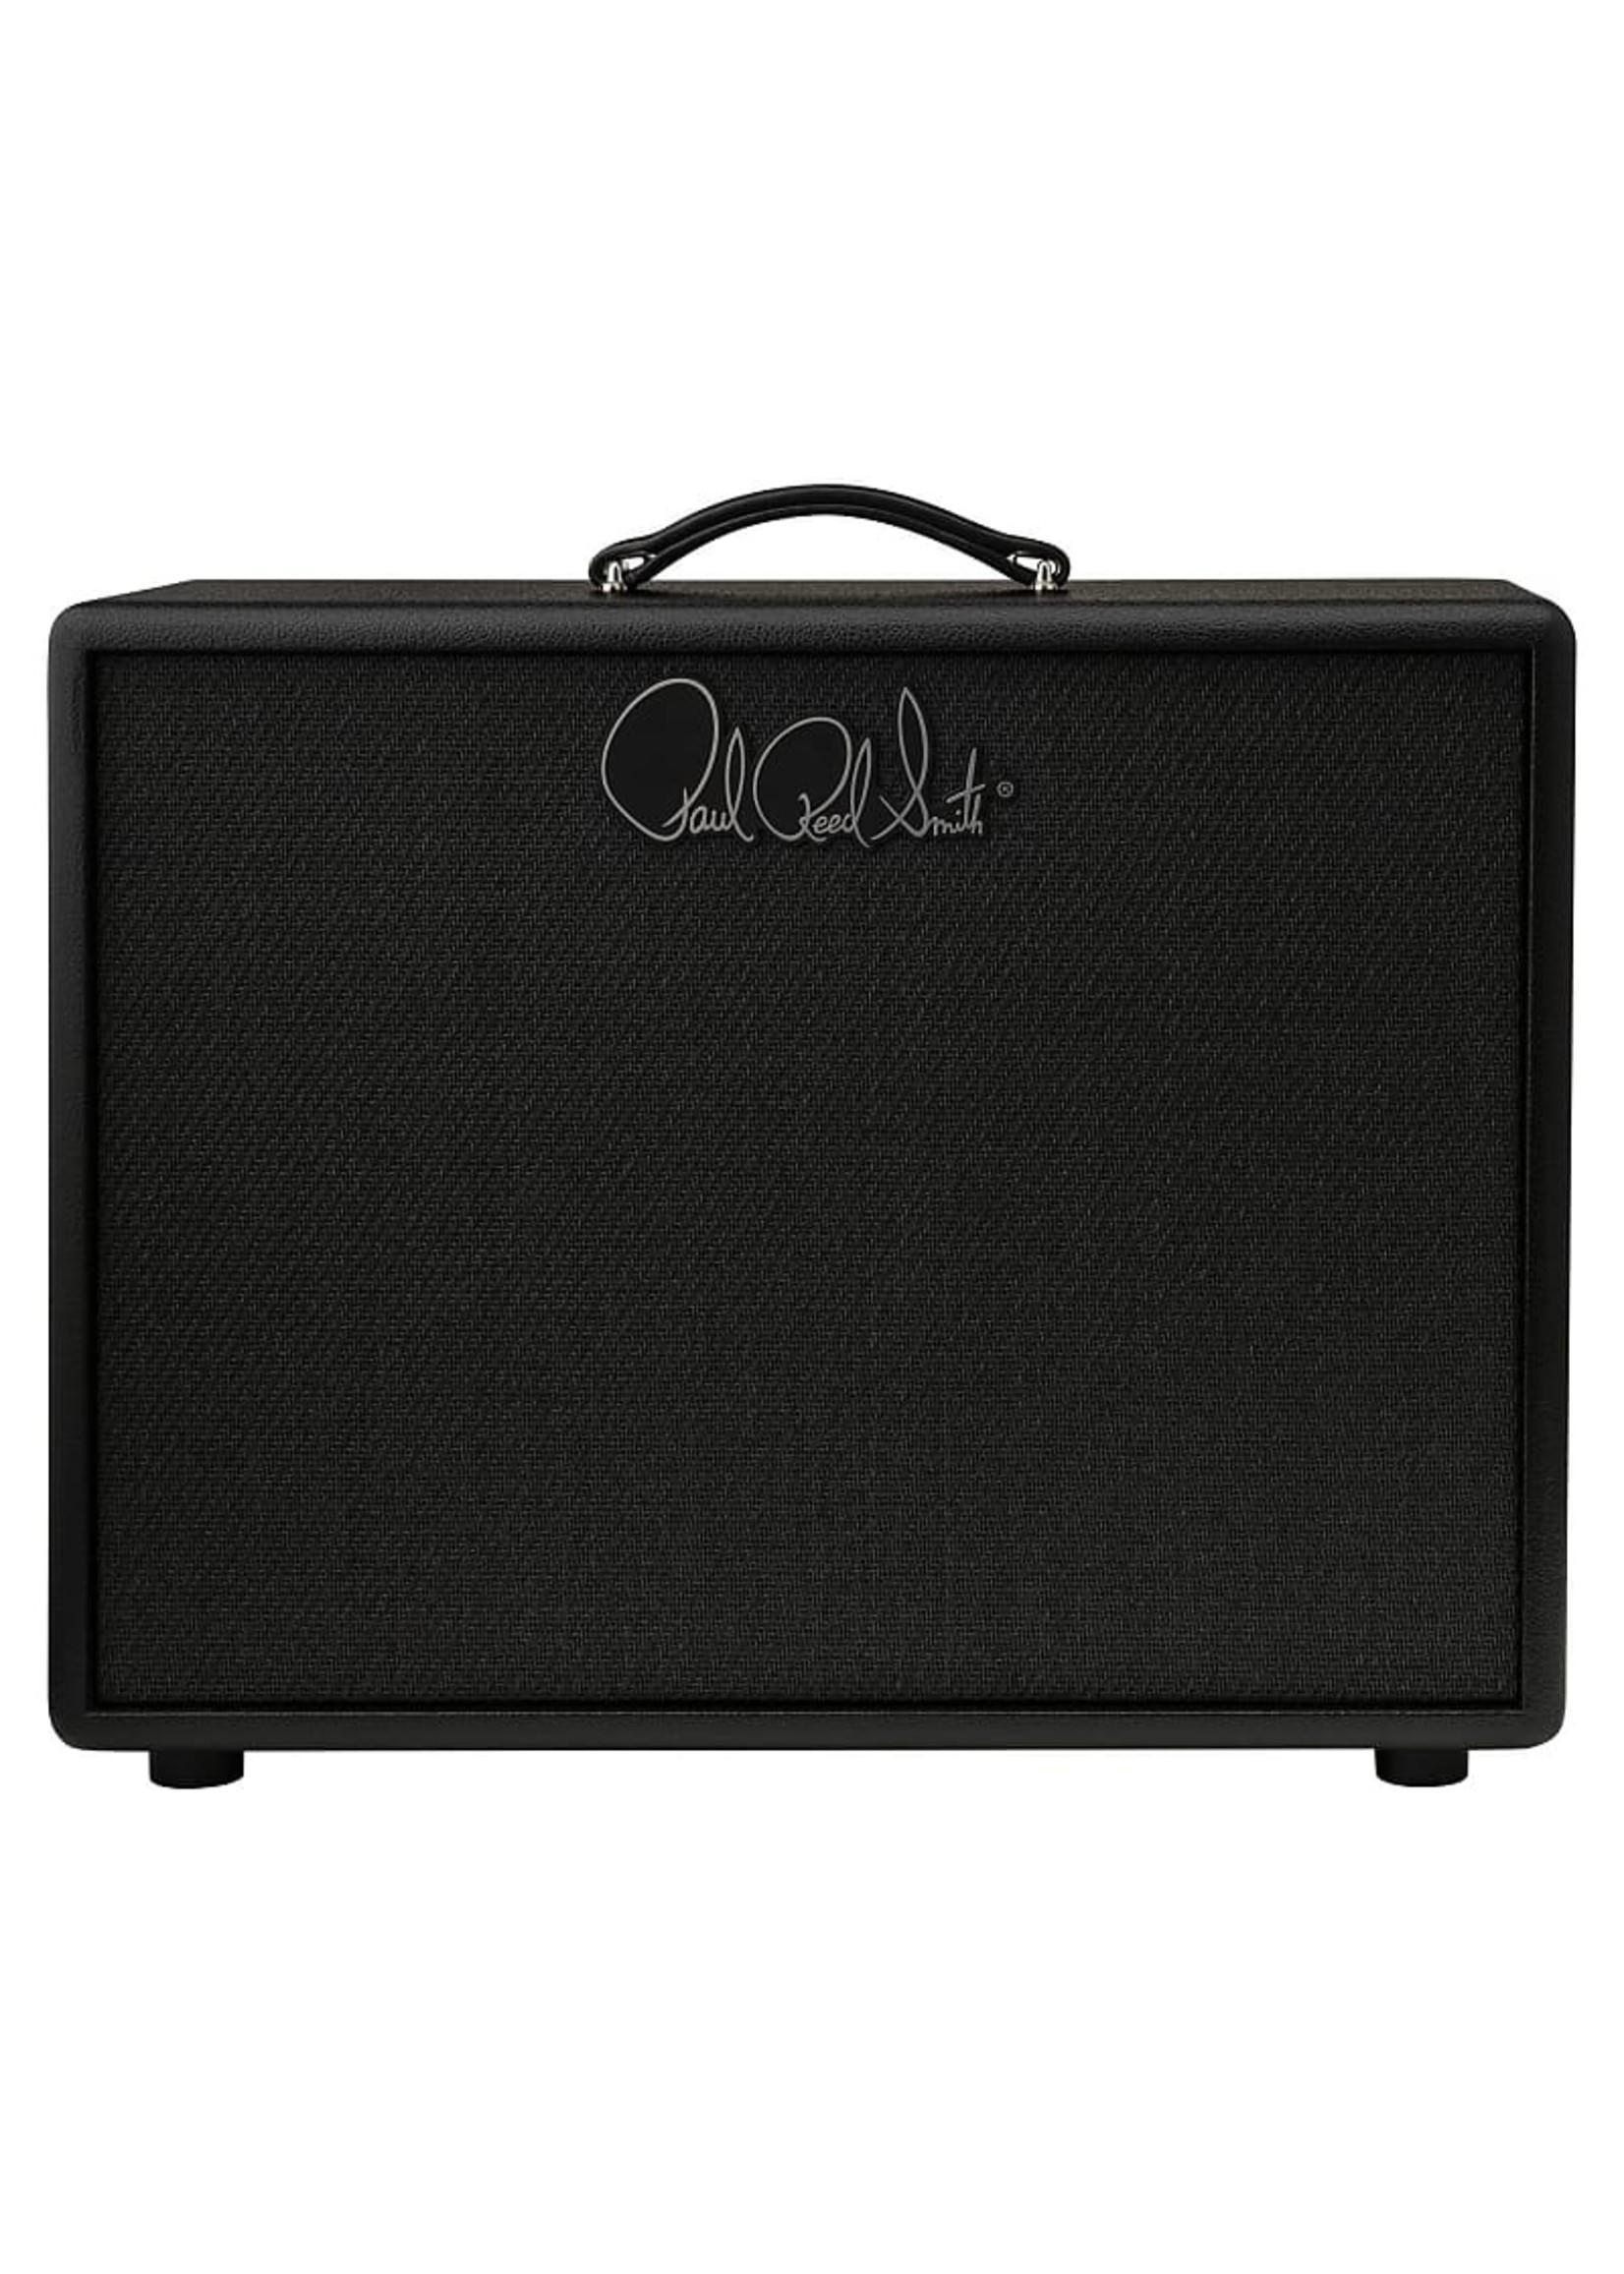 Paul Reed Smith PRS Archon 70-watt 1 x 12-inch Cabinet - Stealth Black